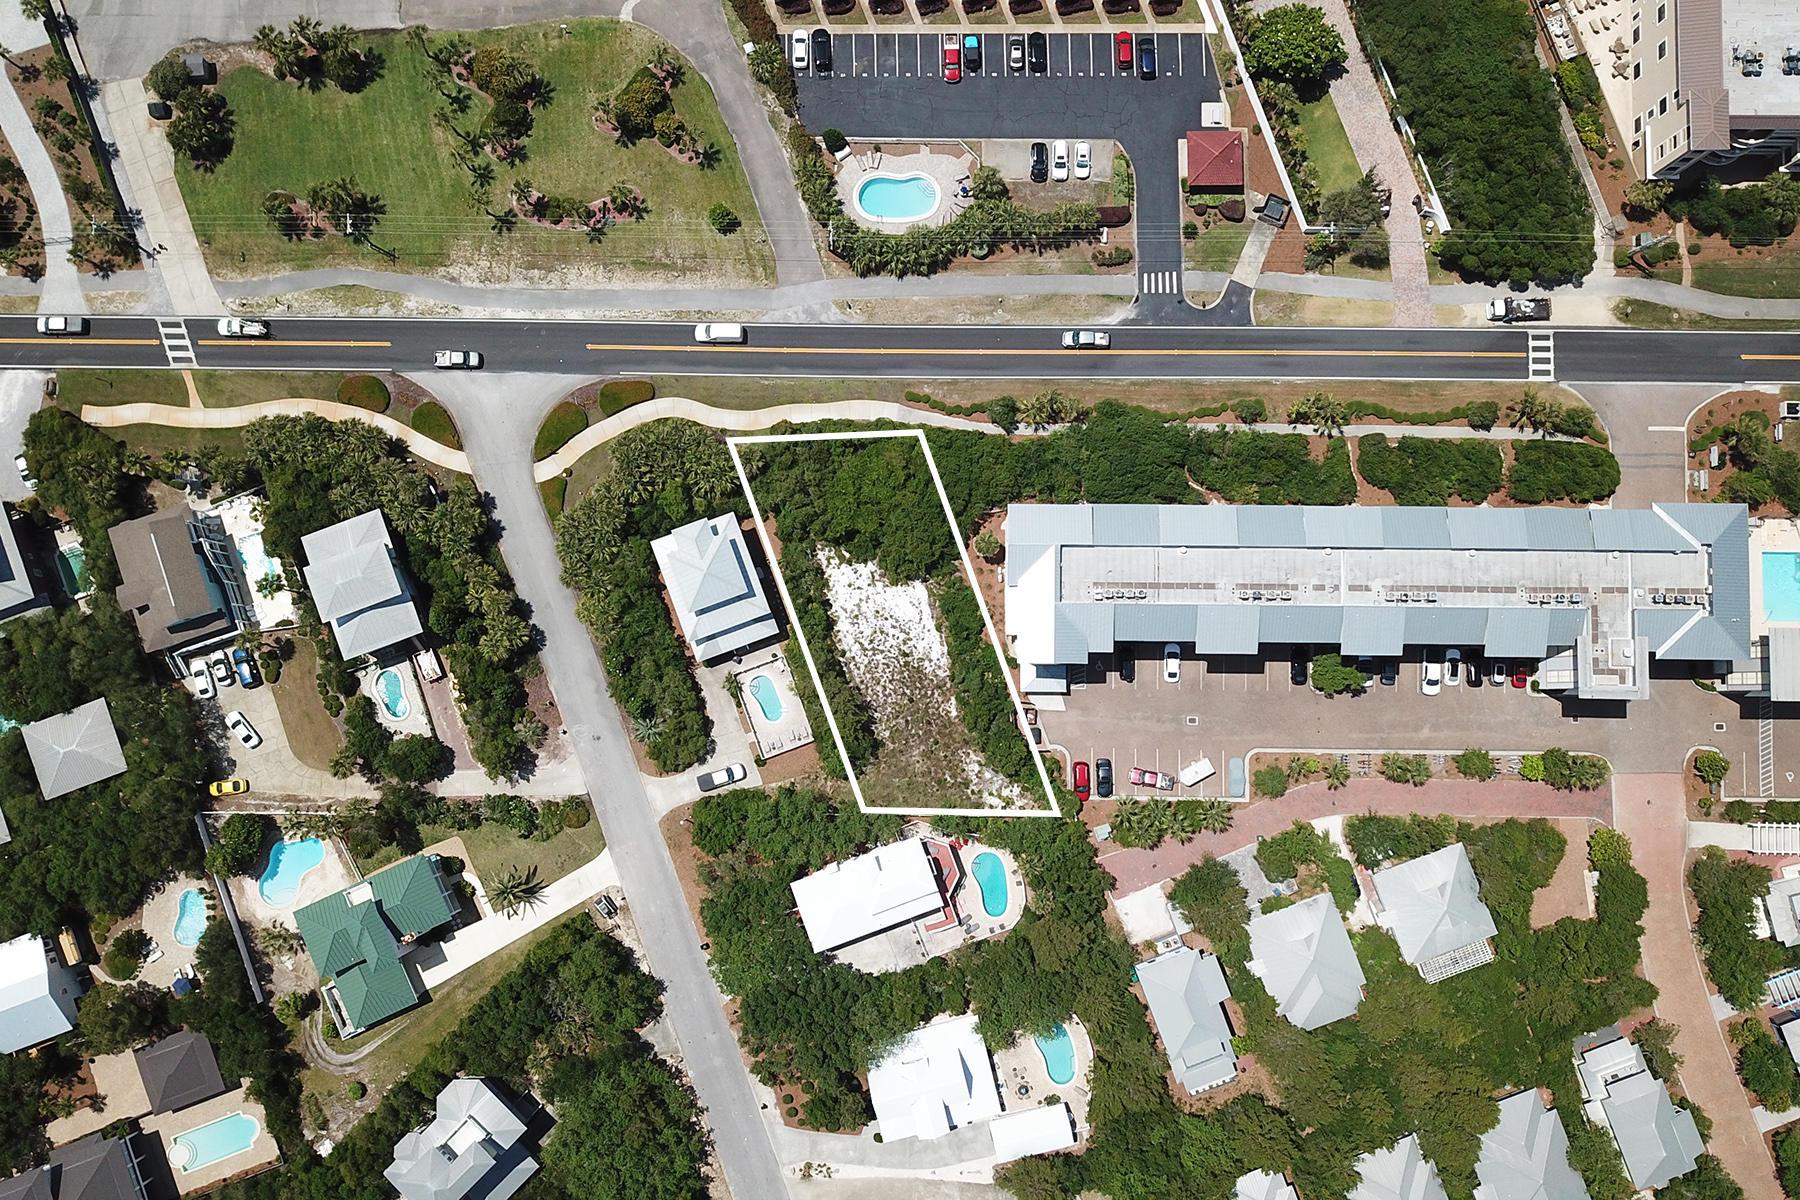 Lot 2 Clareon,Seacrest,Florida 32461,Vacant land,Clareon,20131126143817002353000000